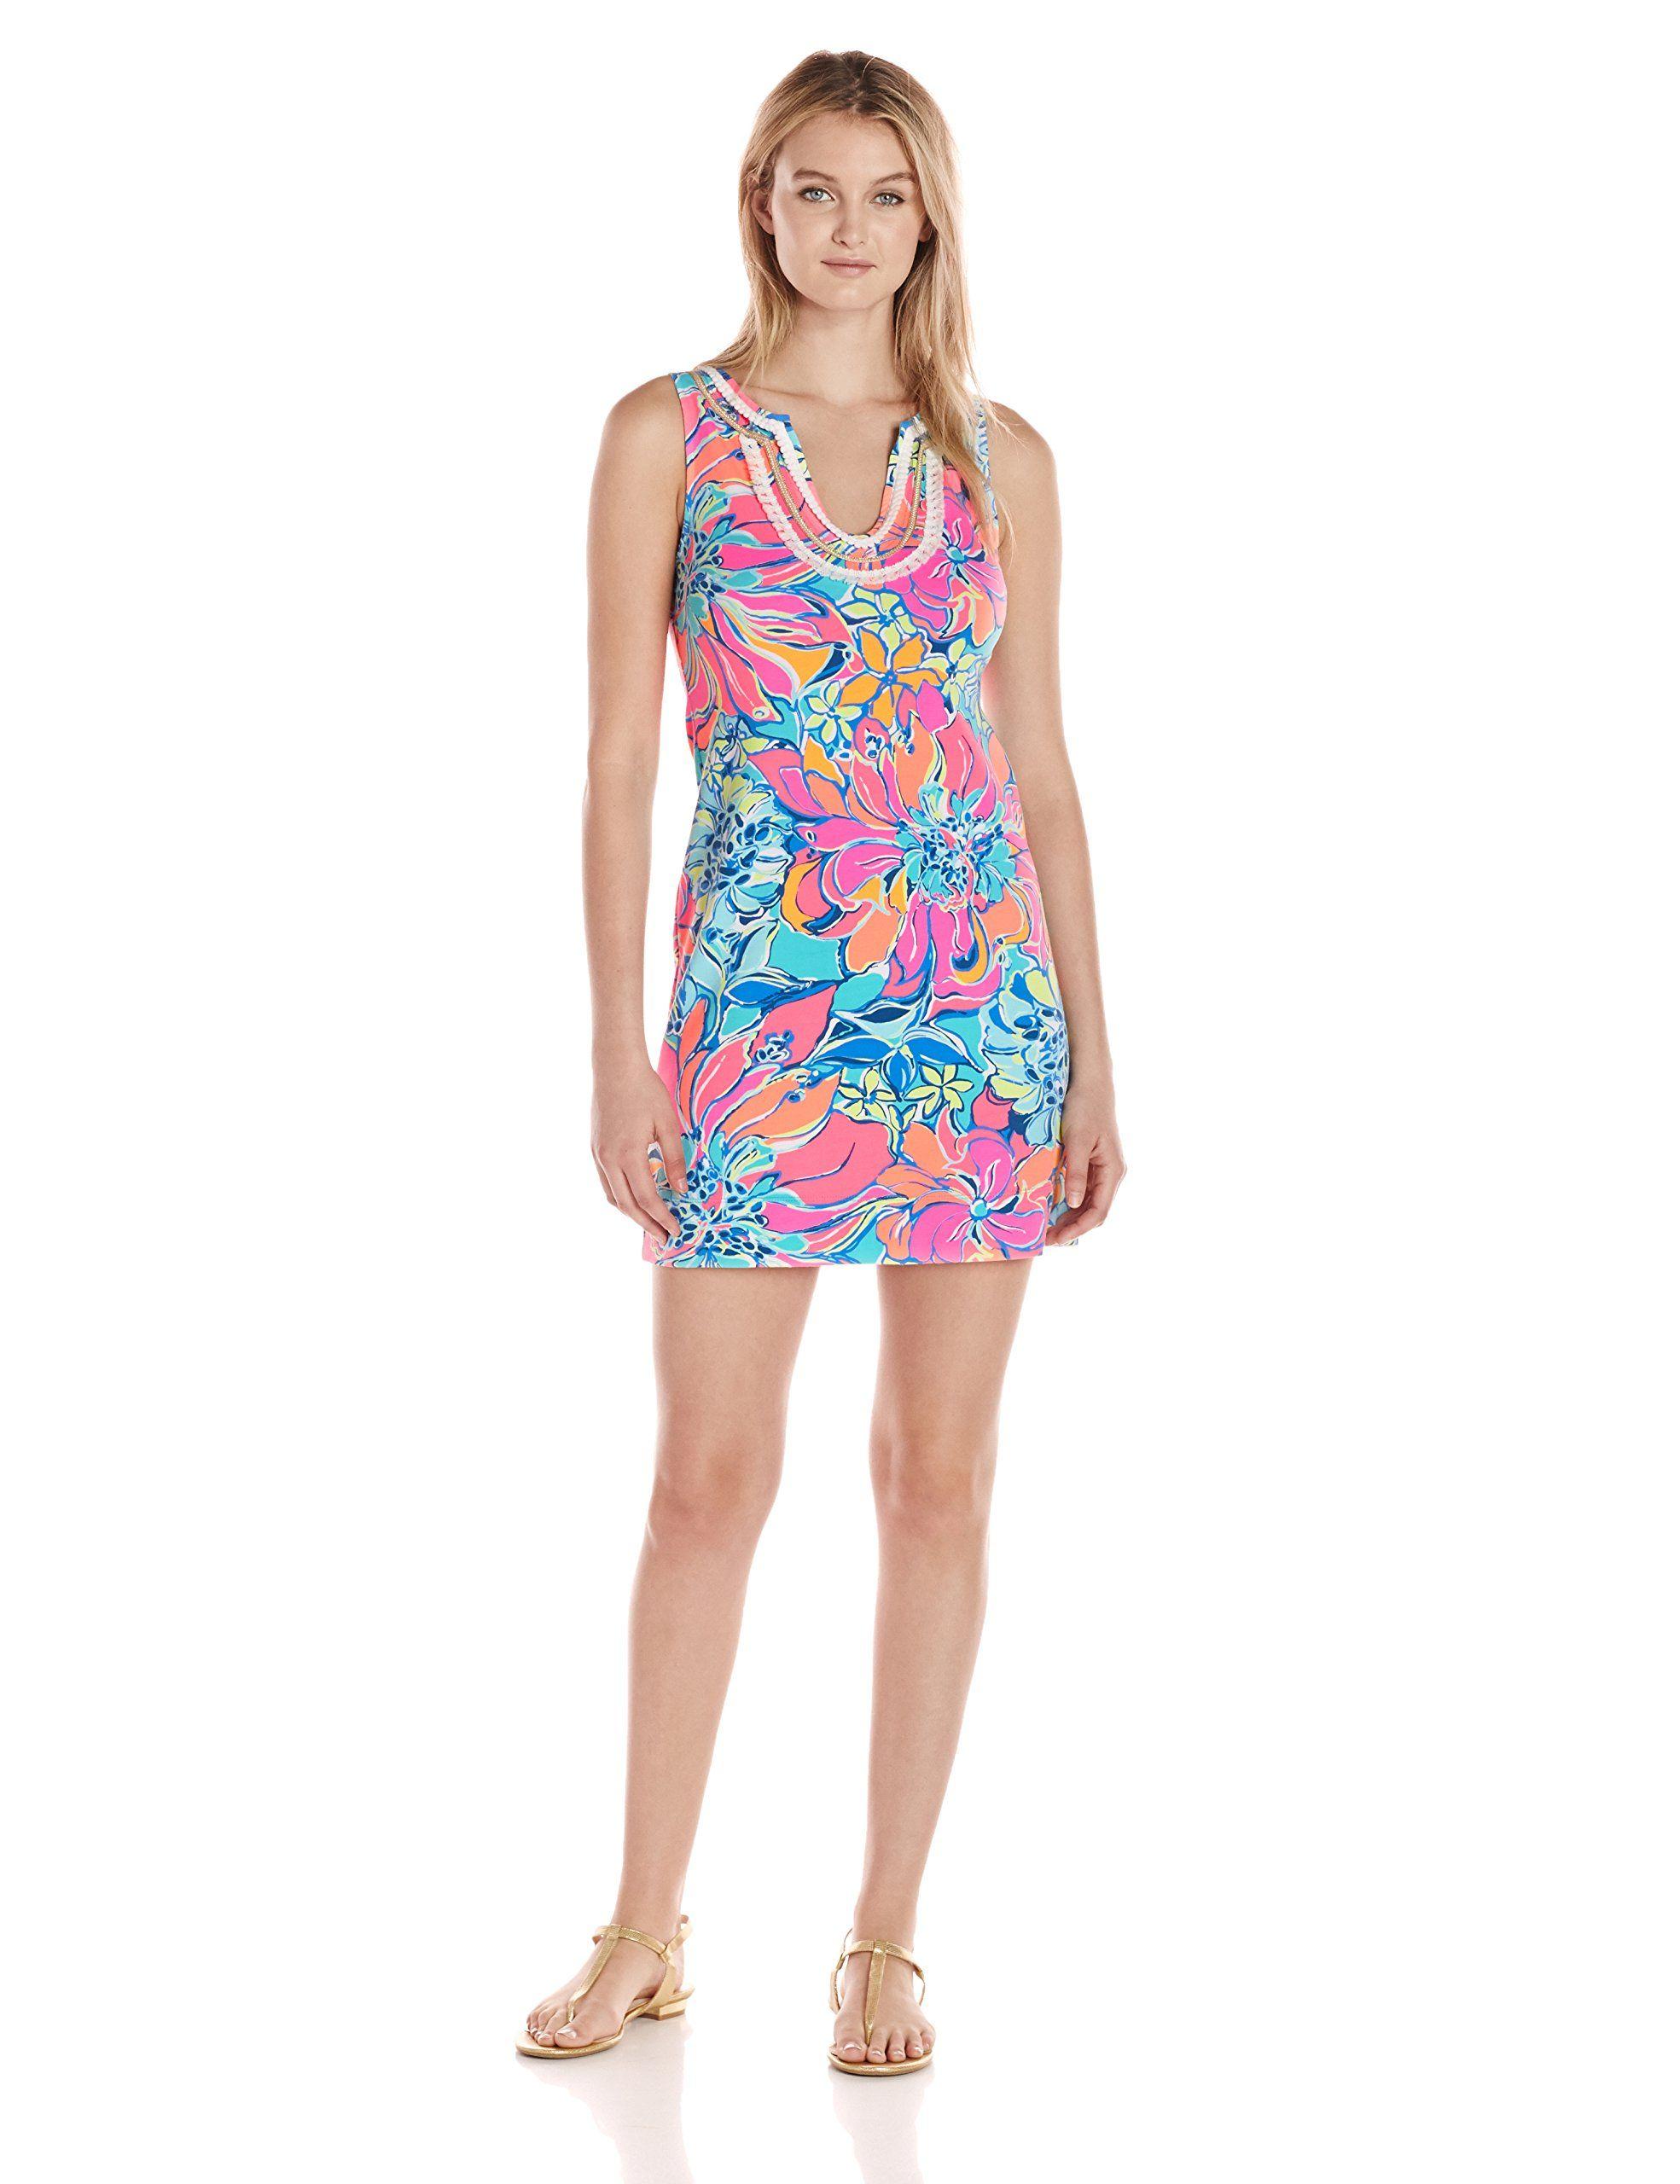 0635910296 Lilly Pulitzer Women's Harper Shift, Seaside Aqua Breezy Babe, S ...